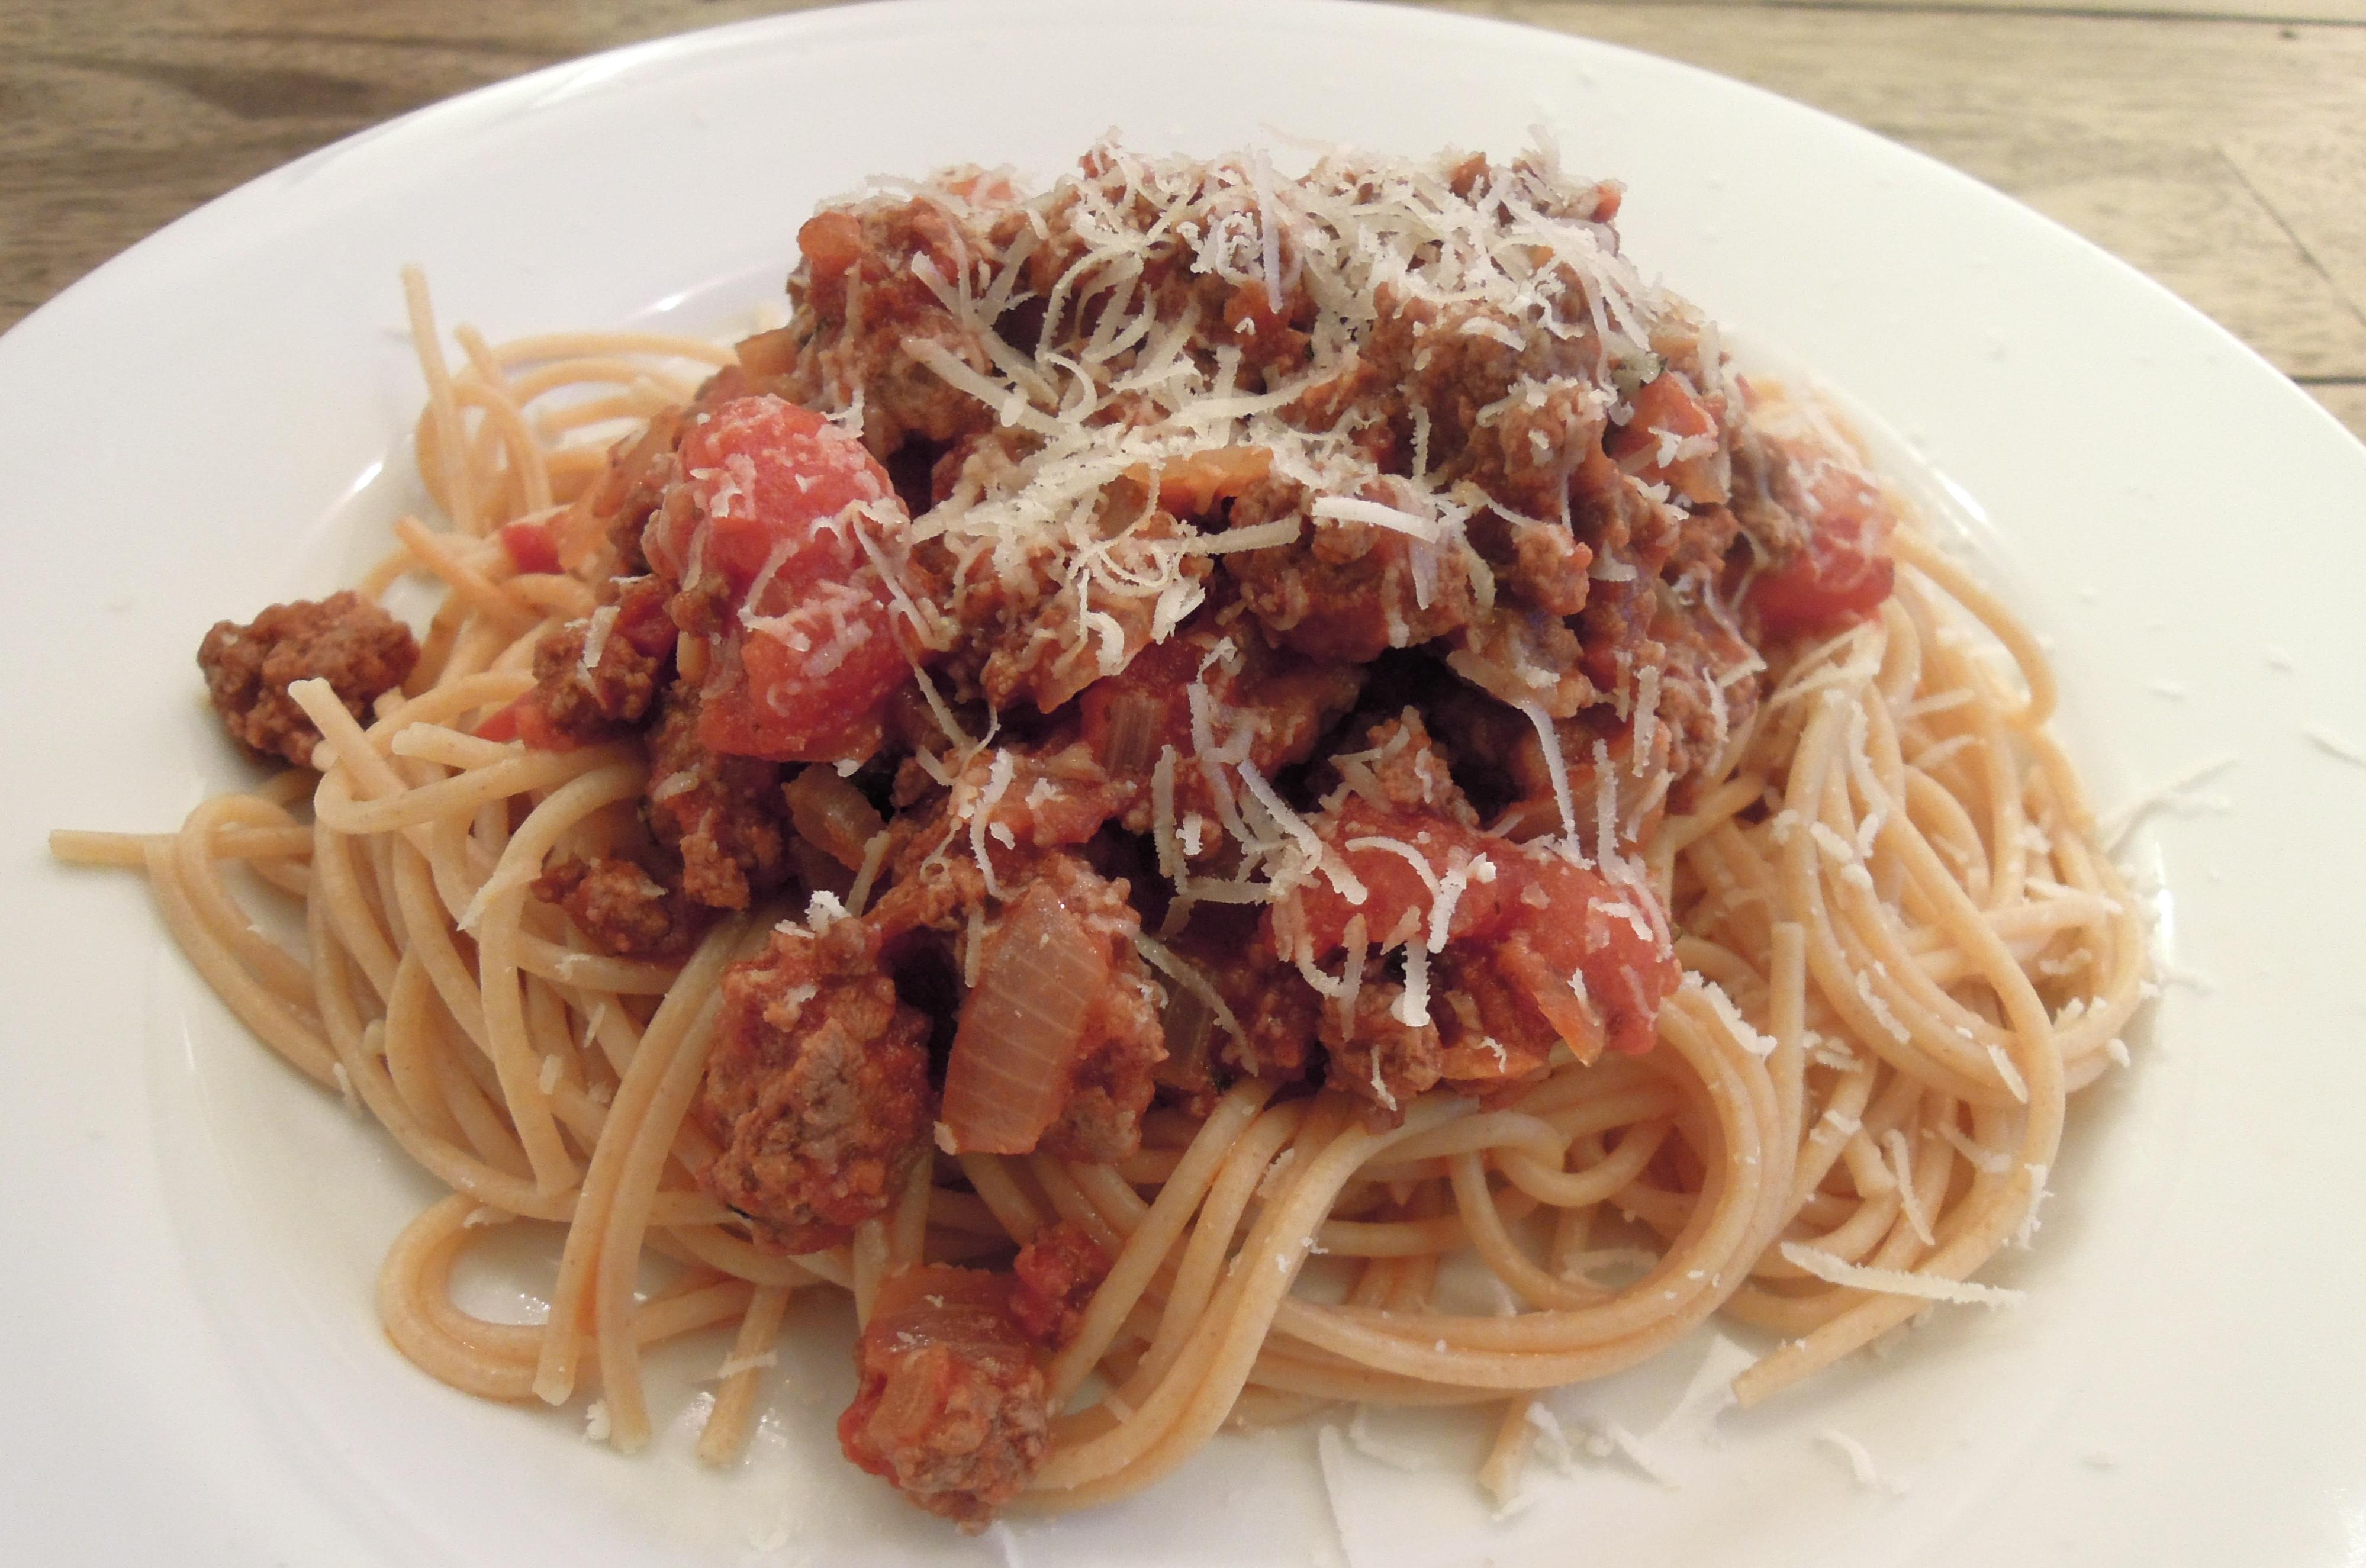 Spaghetti with Meat Sauce | A Balanced Life Cooks